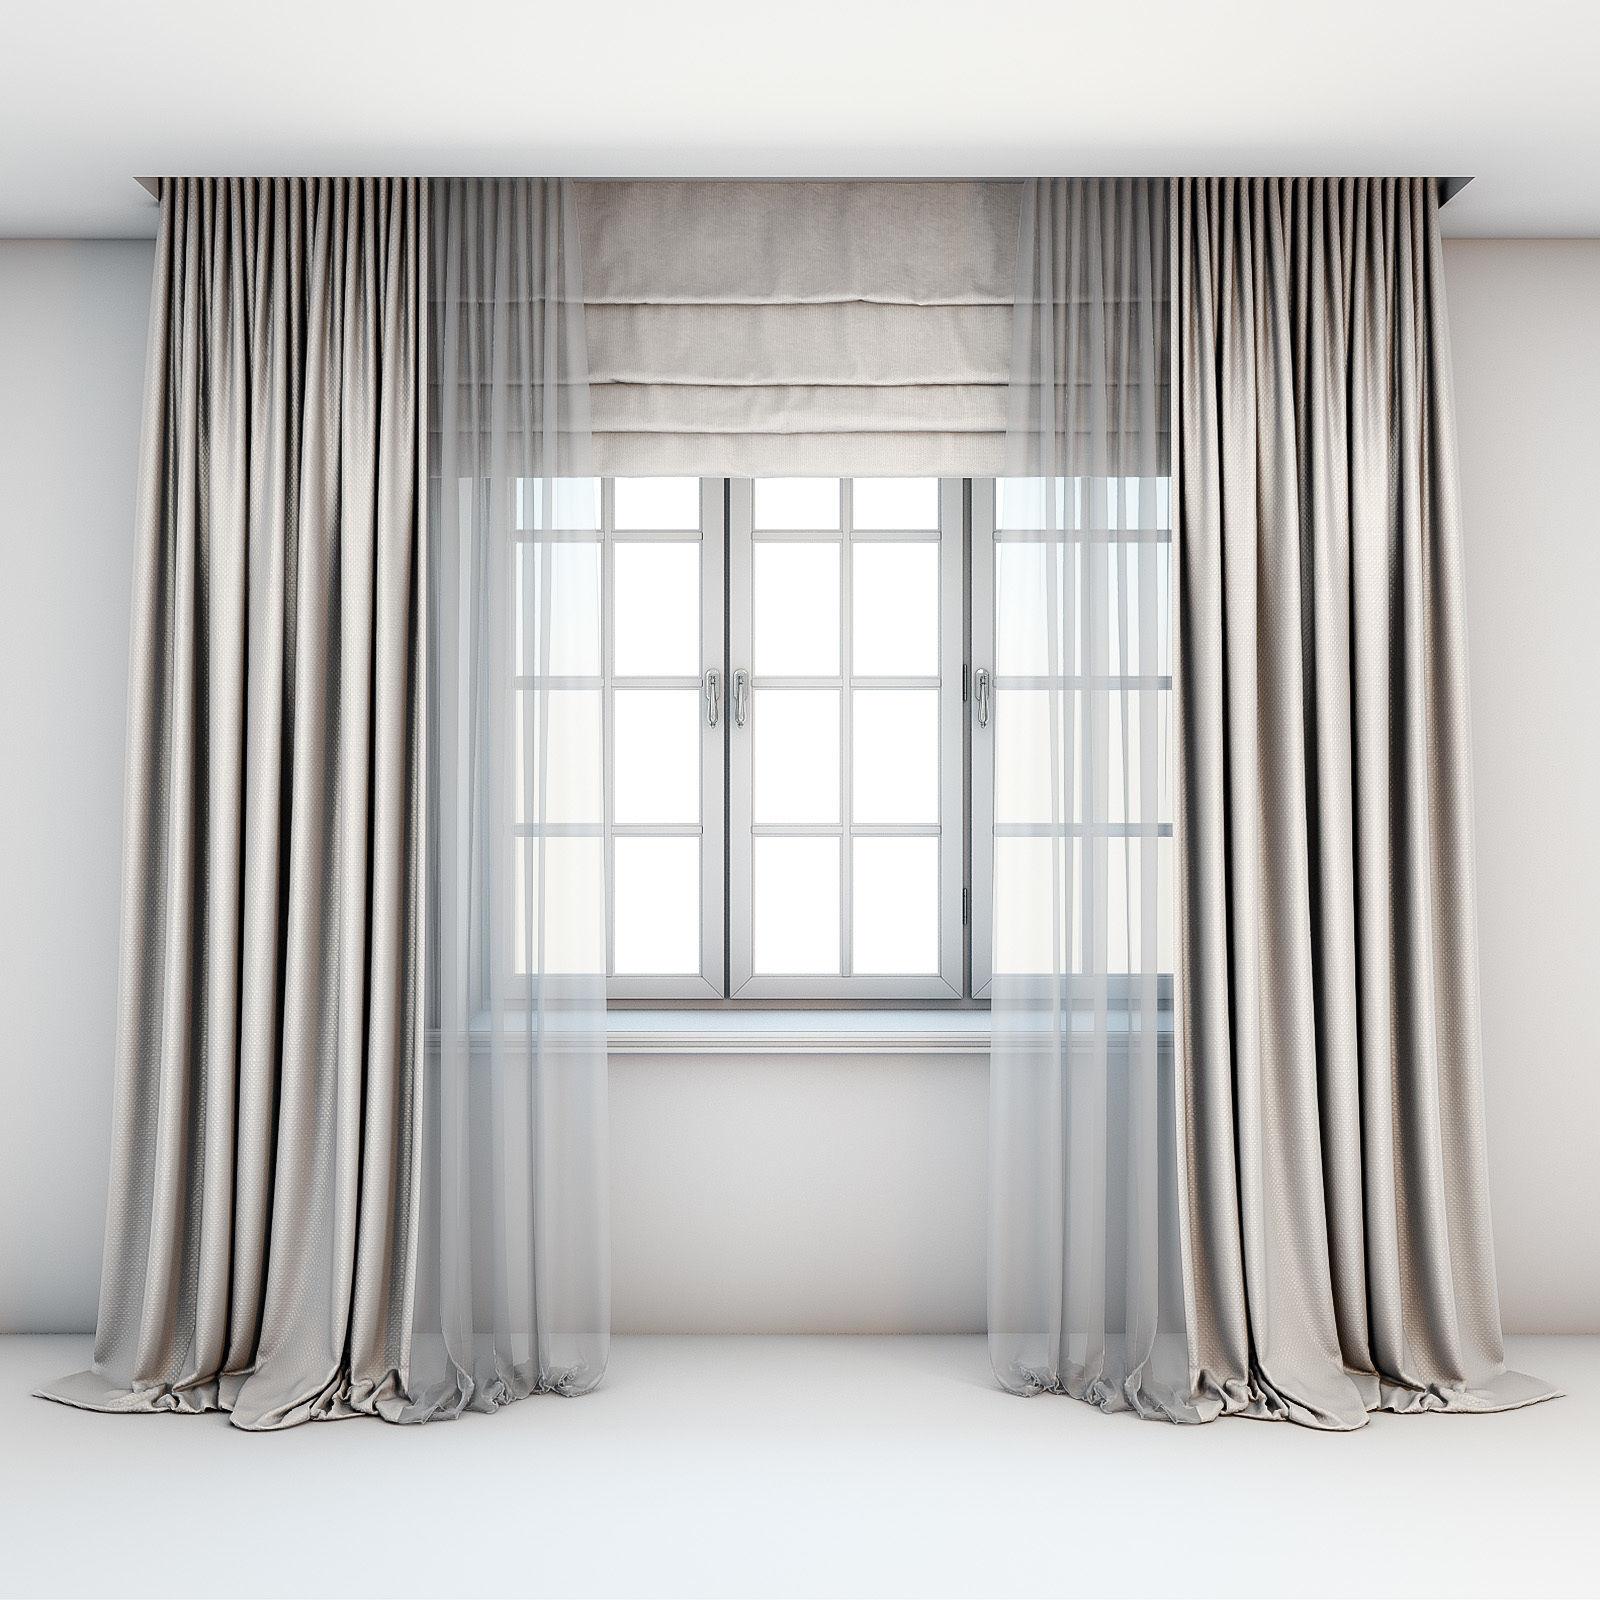 Light beige curtains